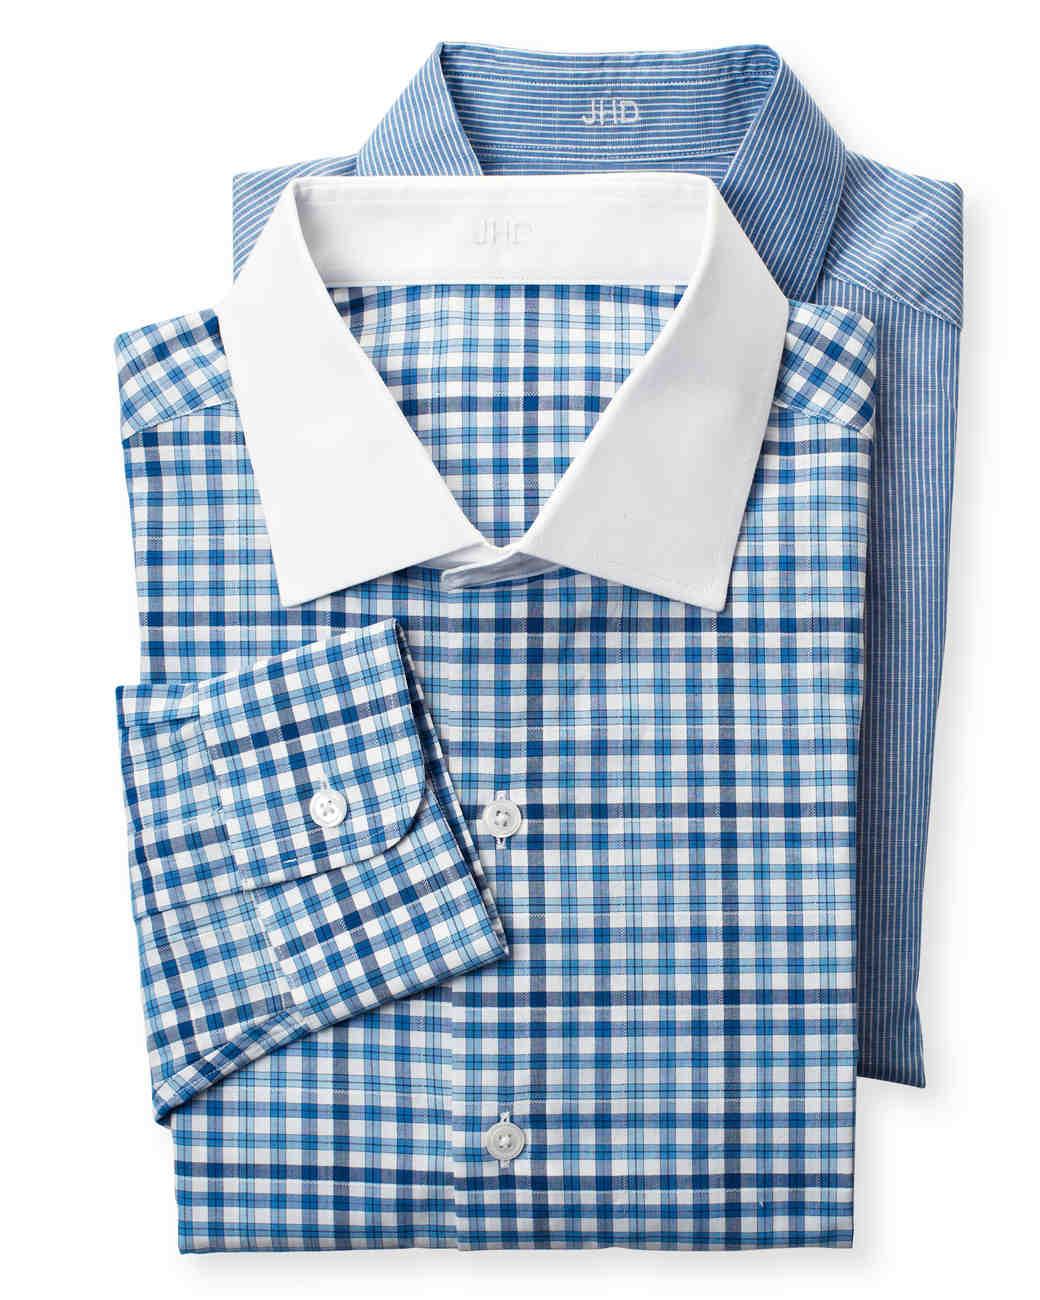 shirts-023-mwd110052.jpg